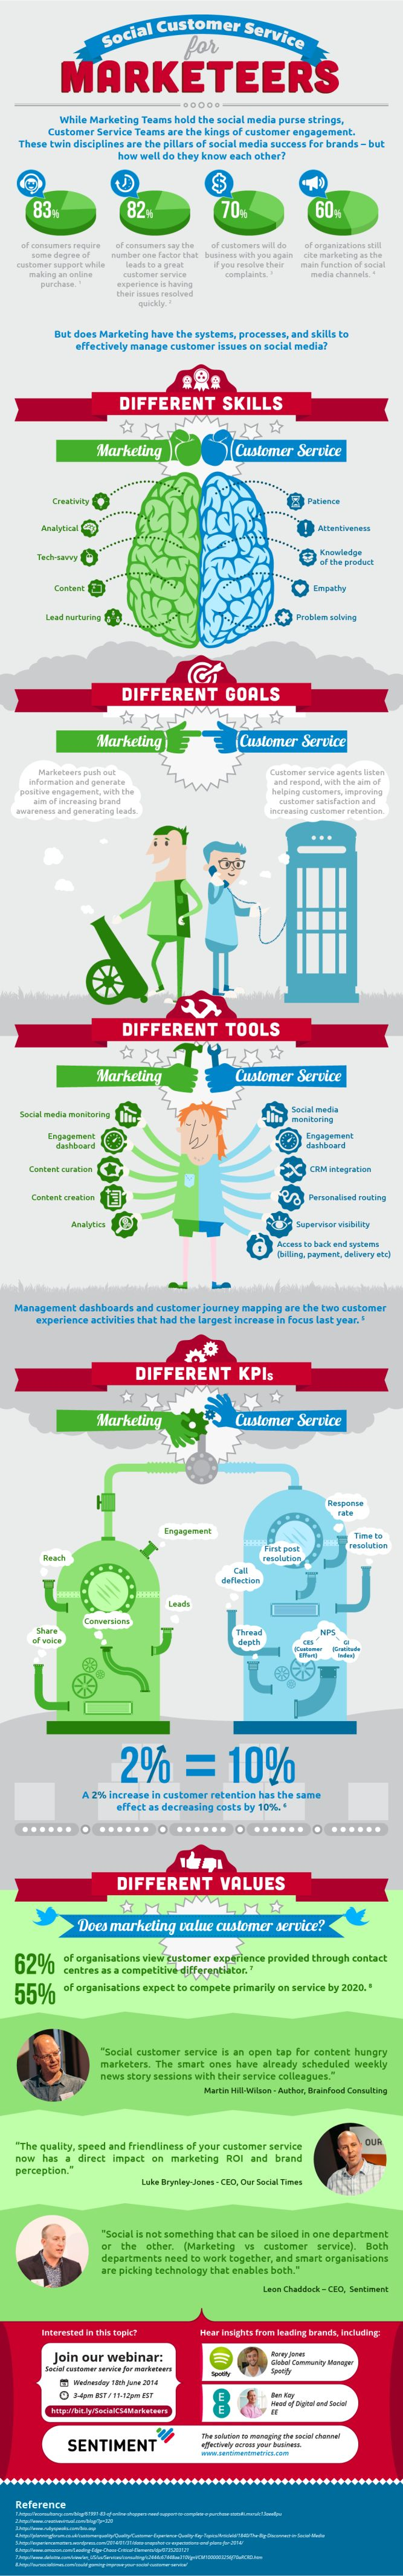 Does Marketing Value Customer Service?